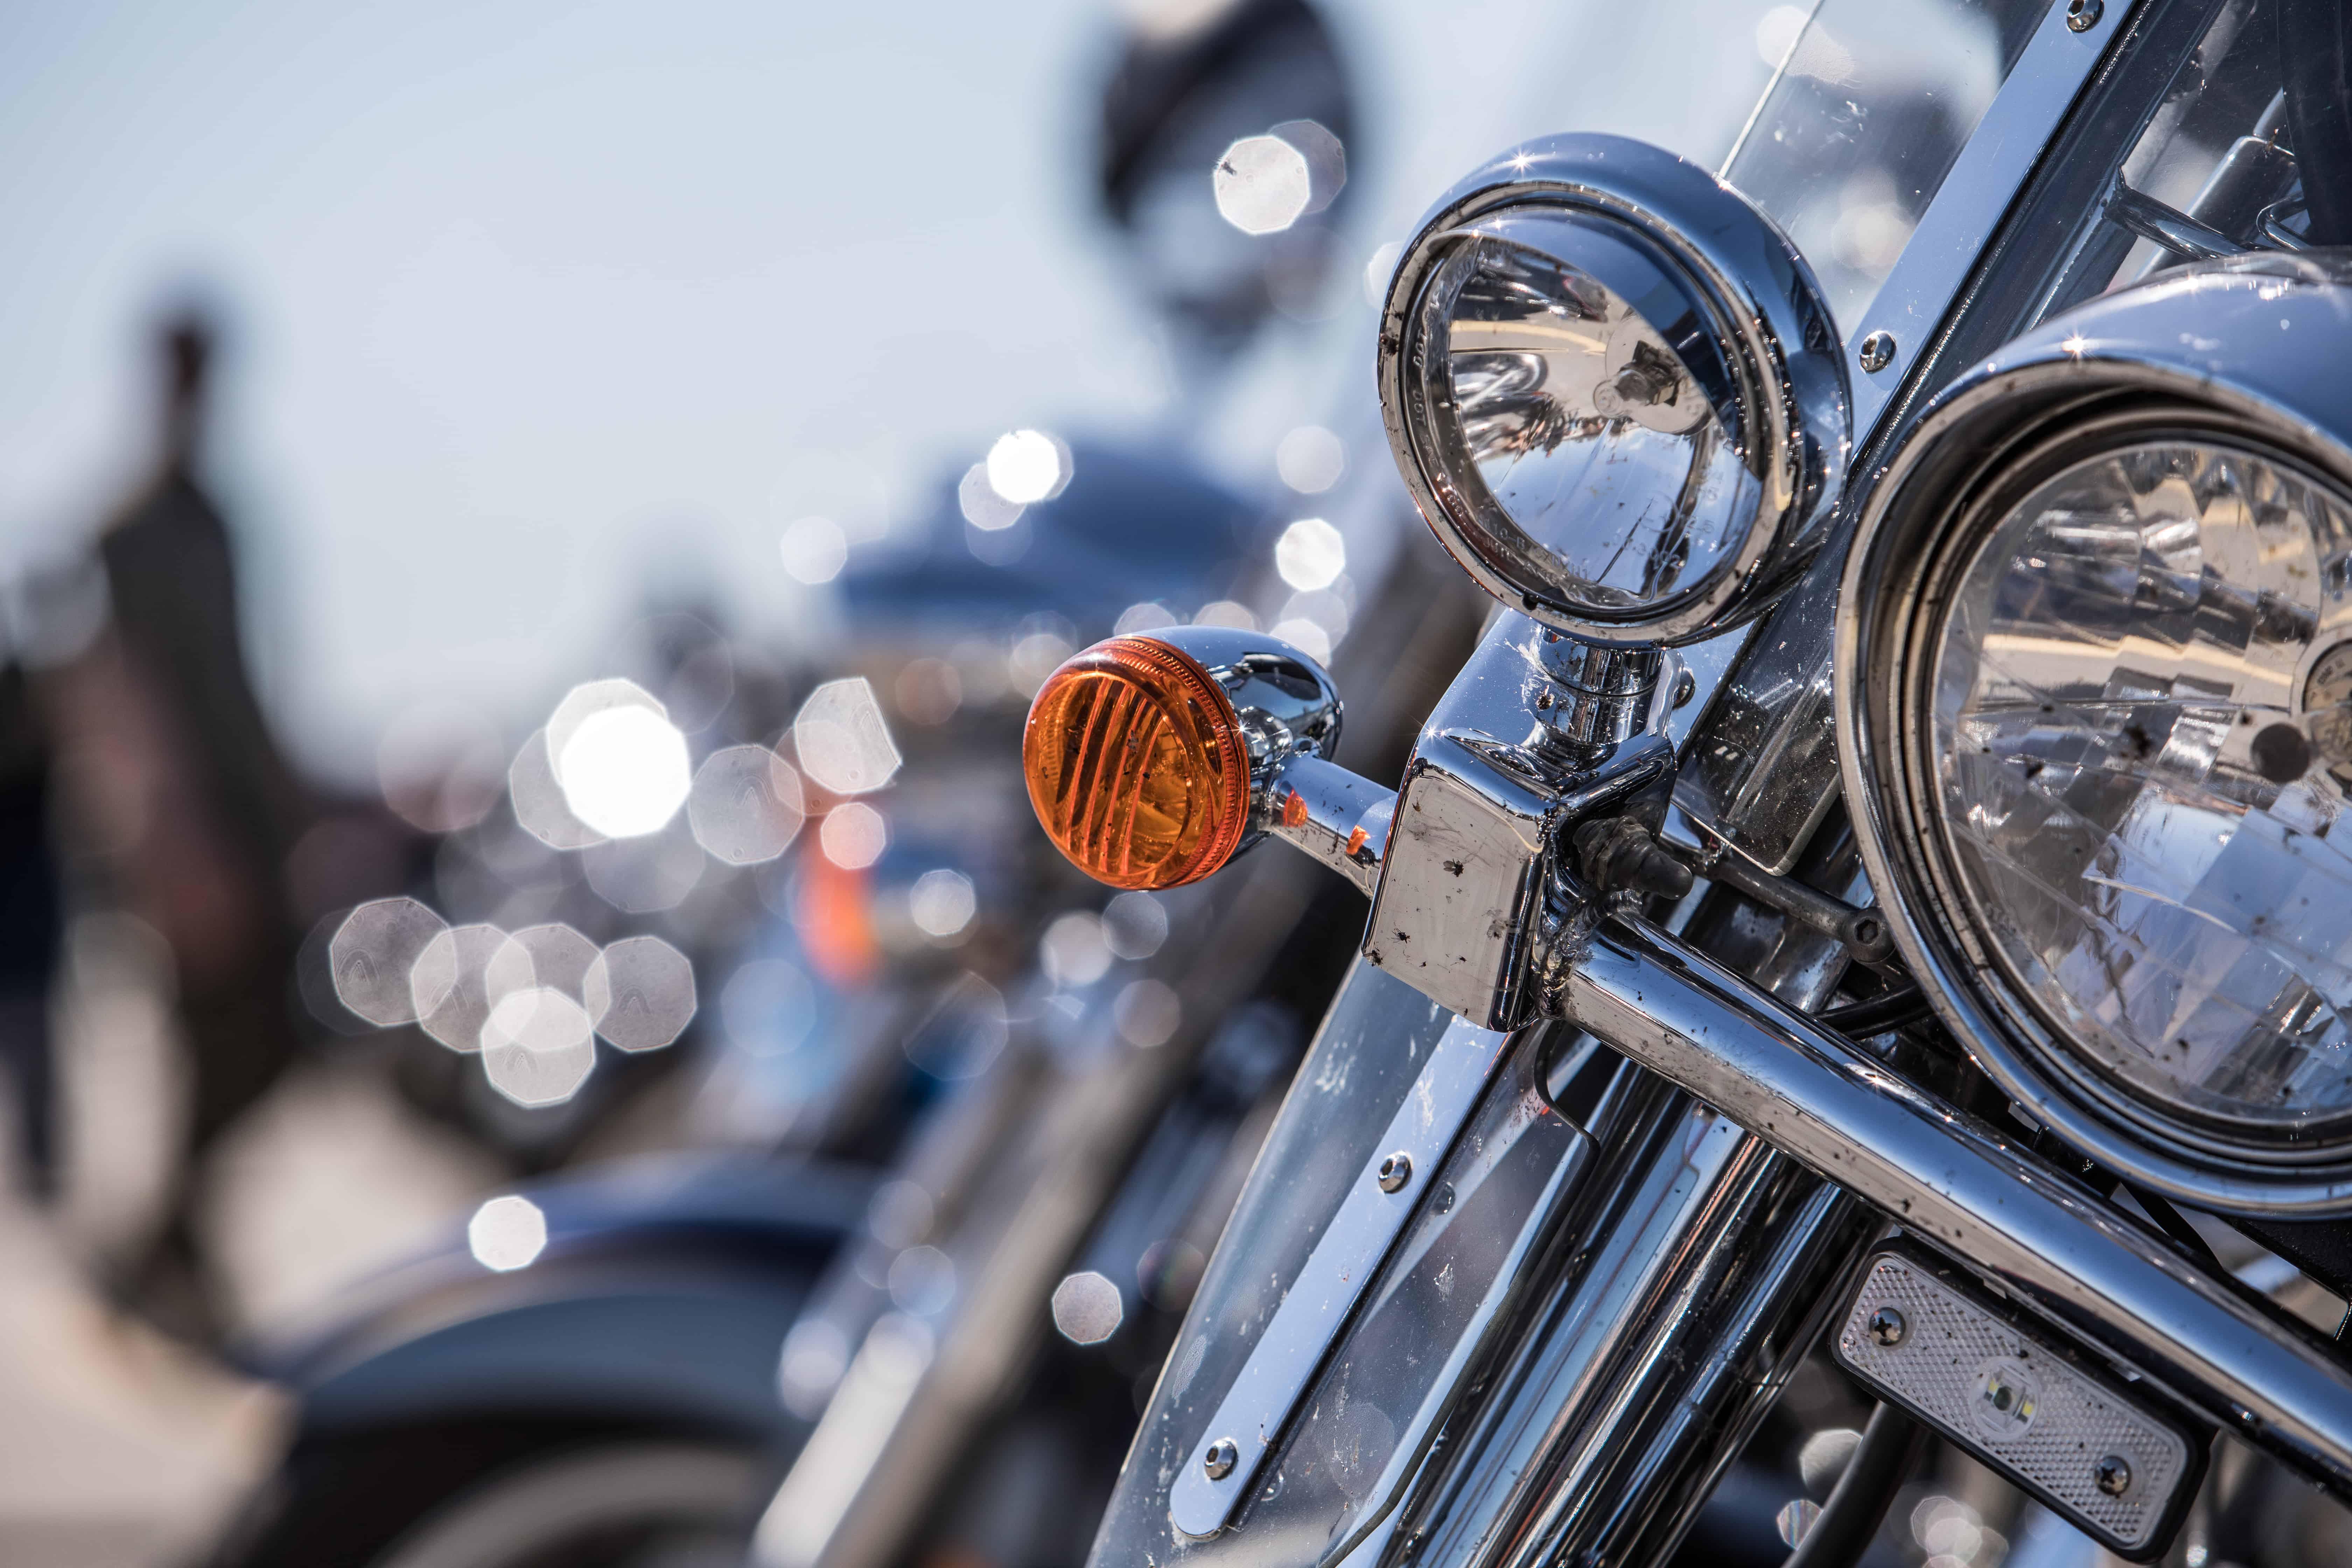 Motorcyclist Critically Injured in Roseville Parkway Crash [Roseville, CA]